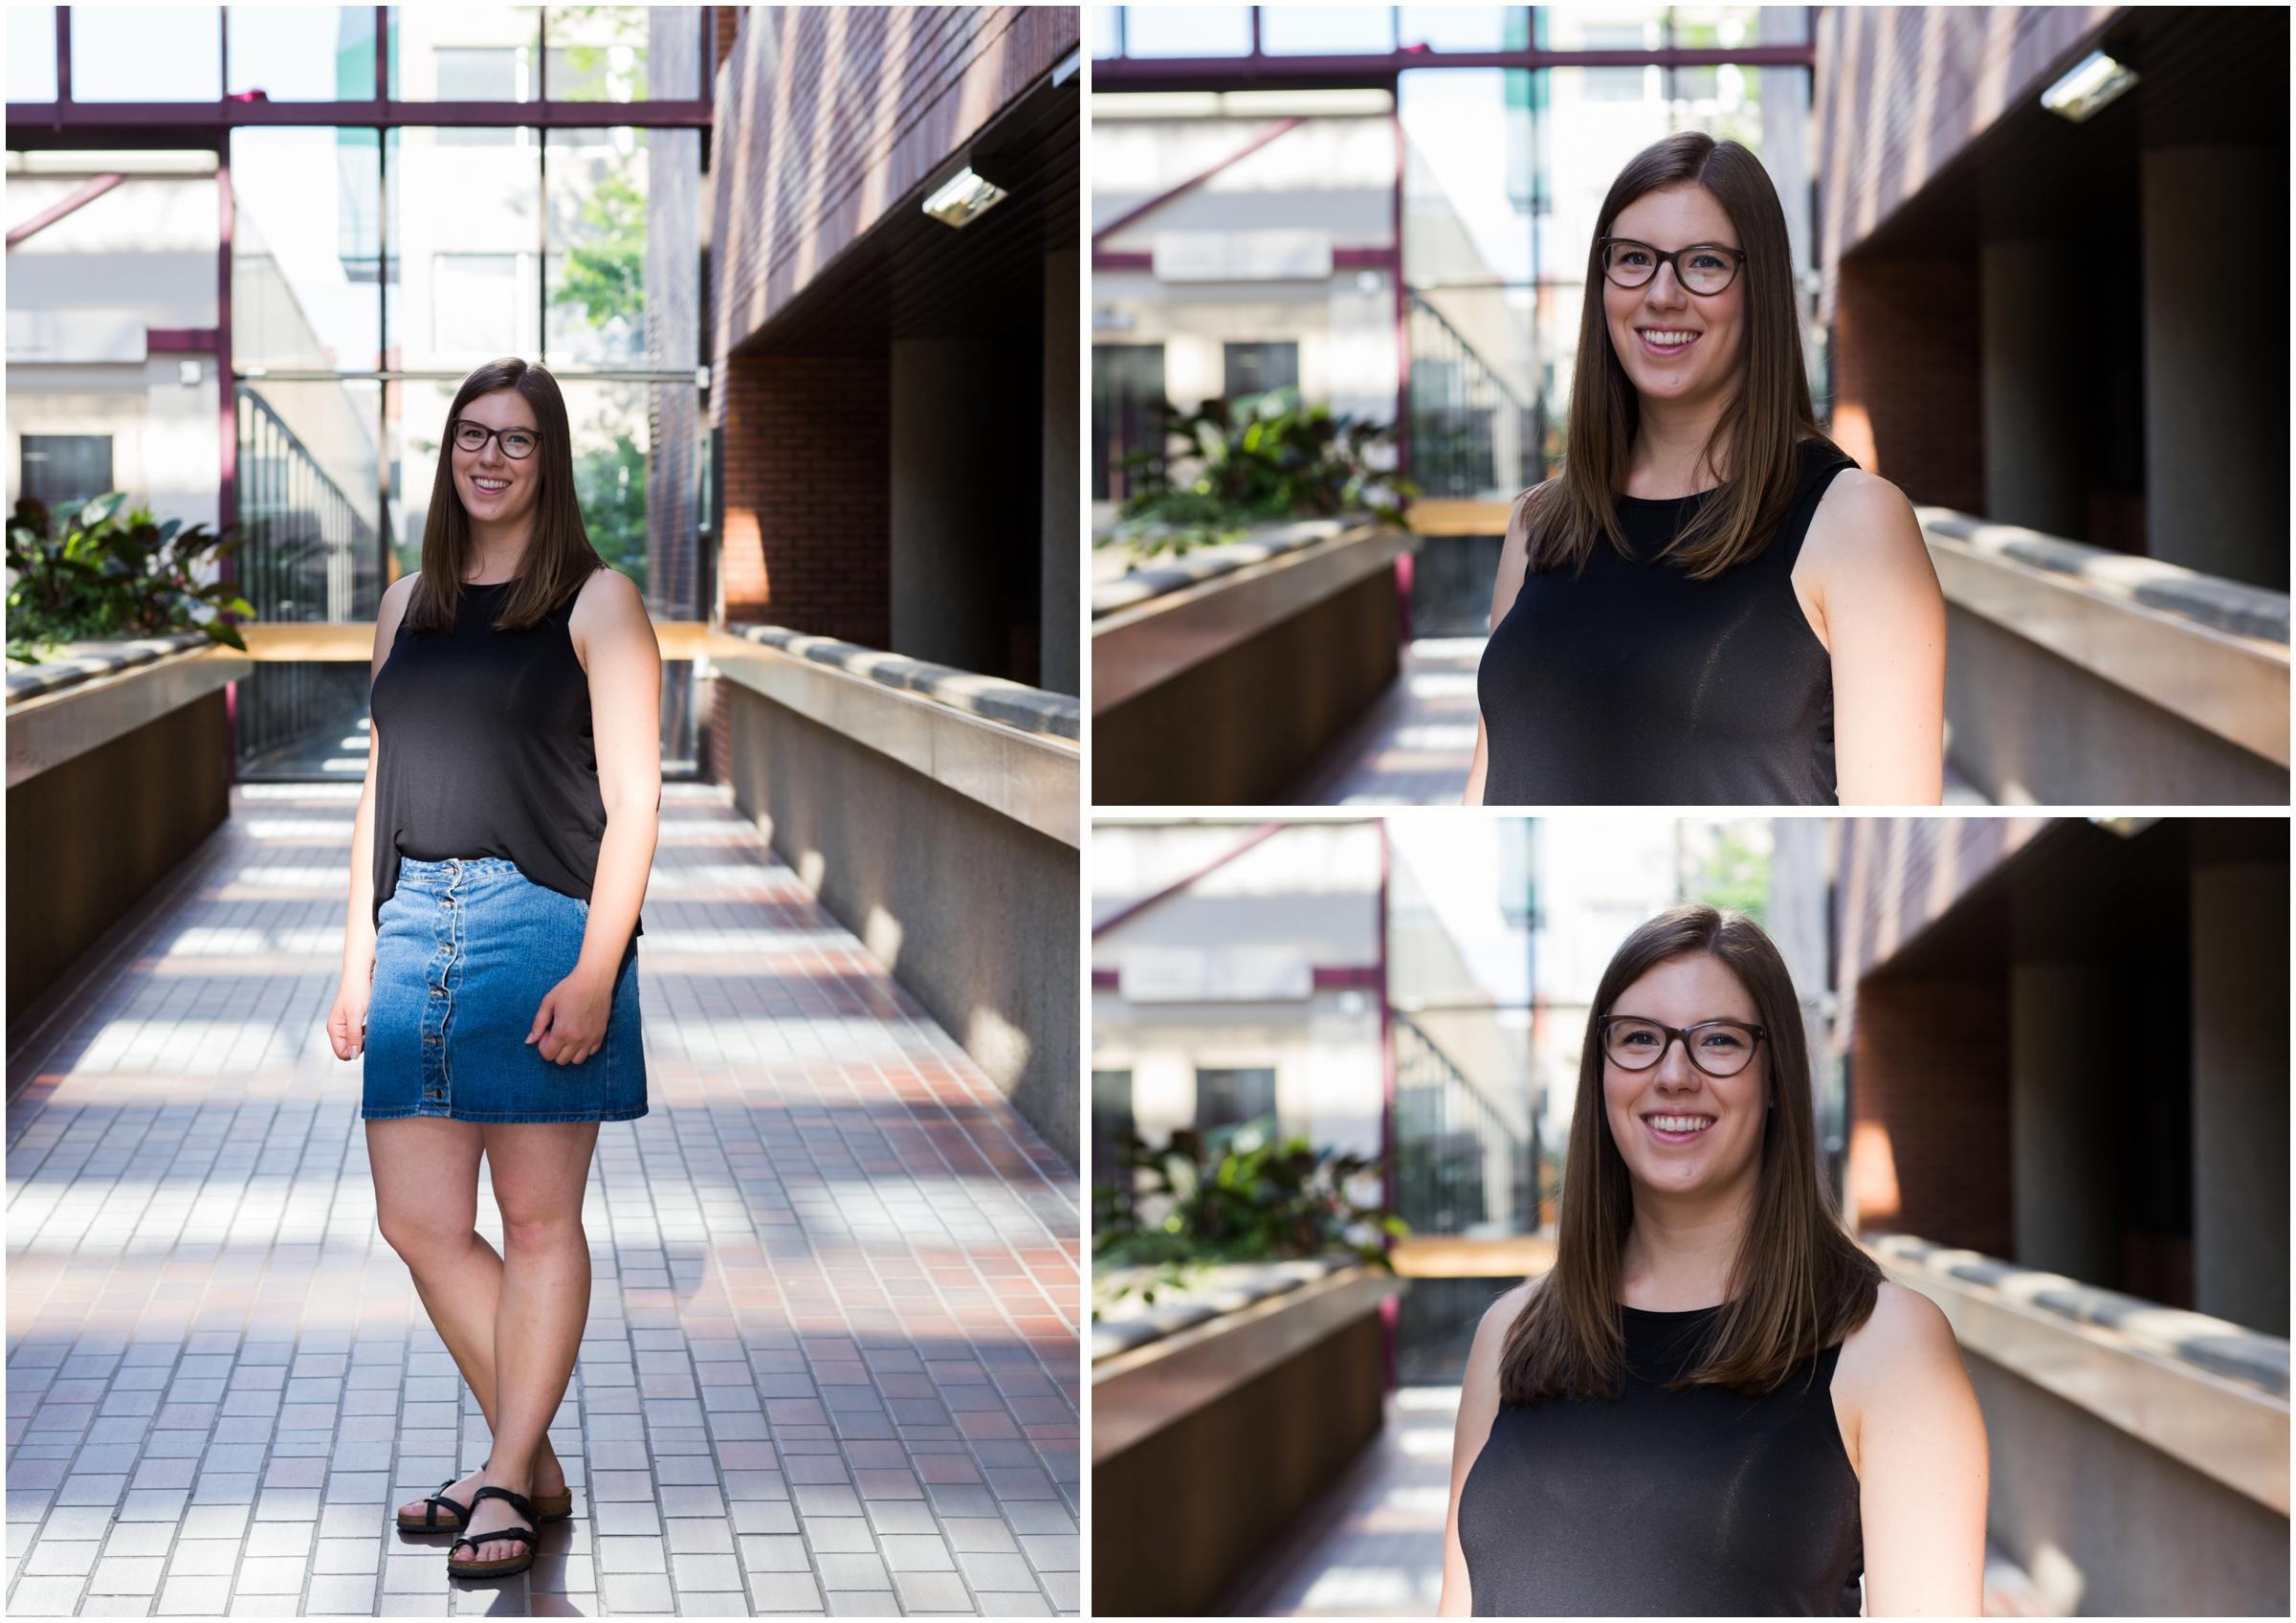 Edmonton Family Photo Session - (Selena Phillips-Boyle)_0019.jpg